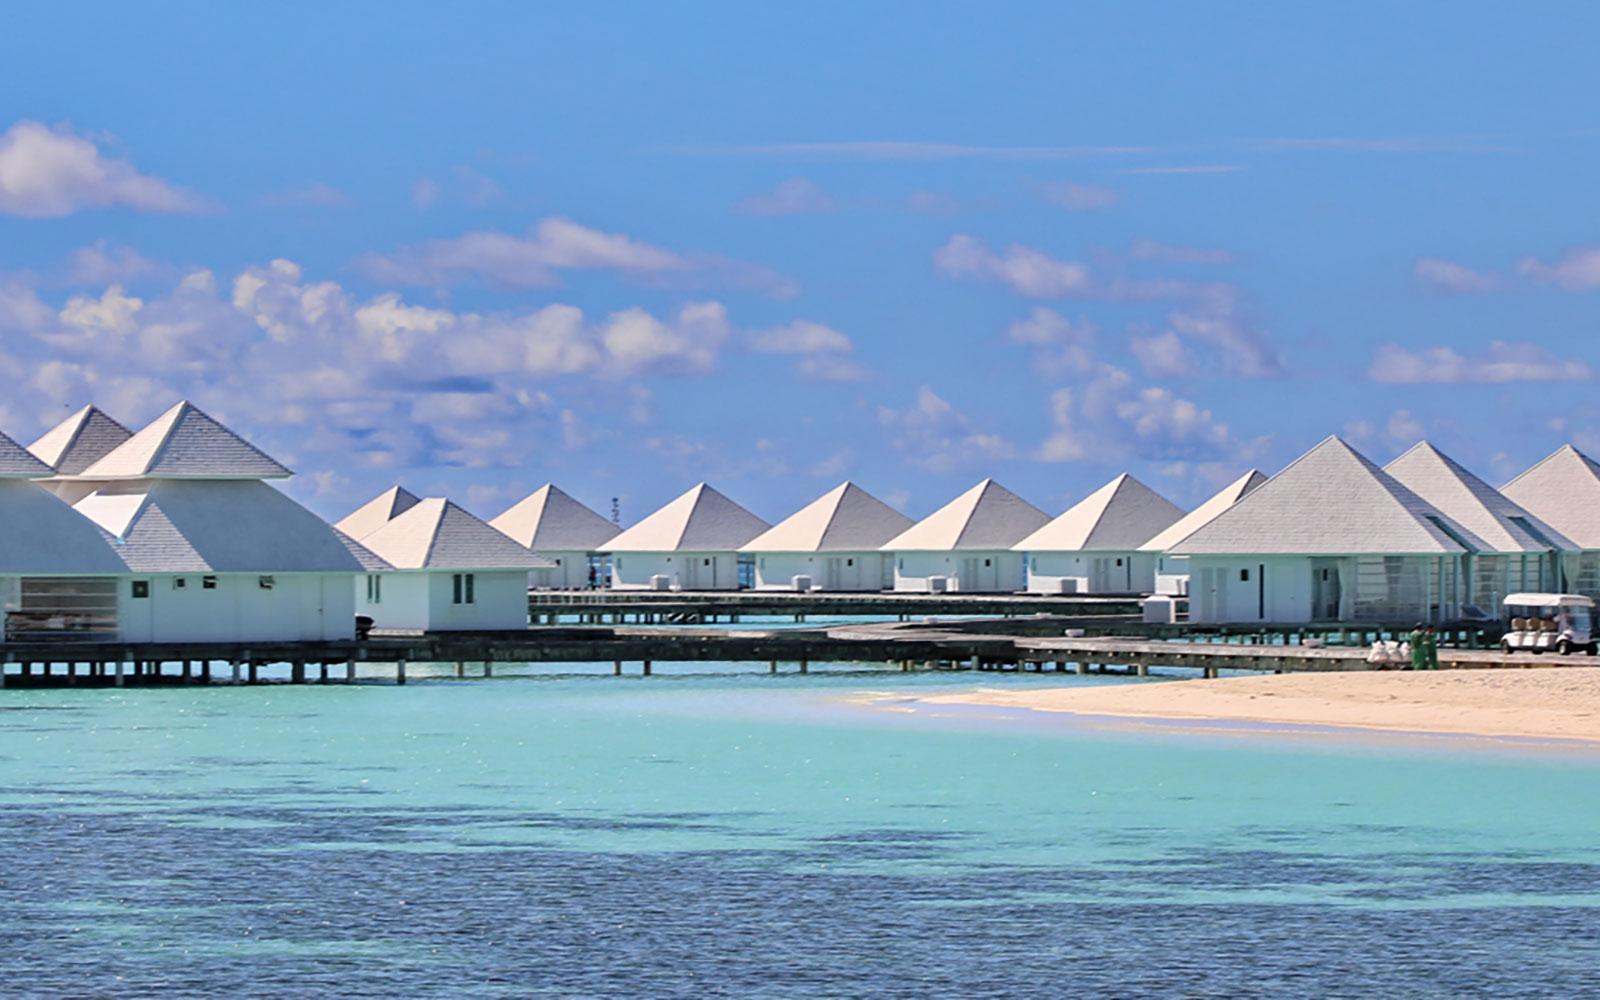 Maldive_271119_1450.jpg